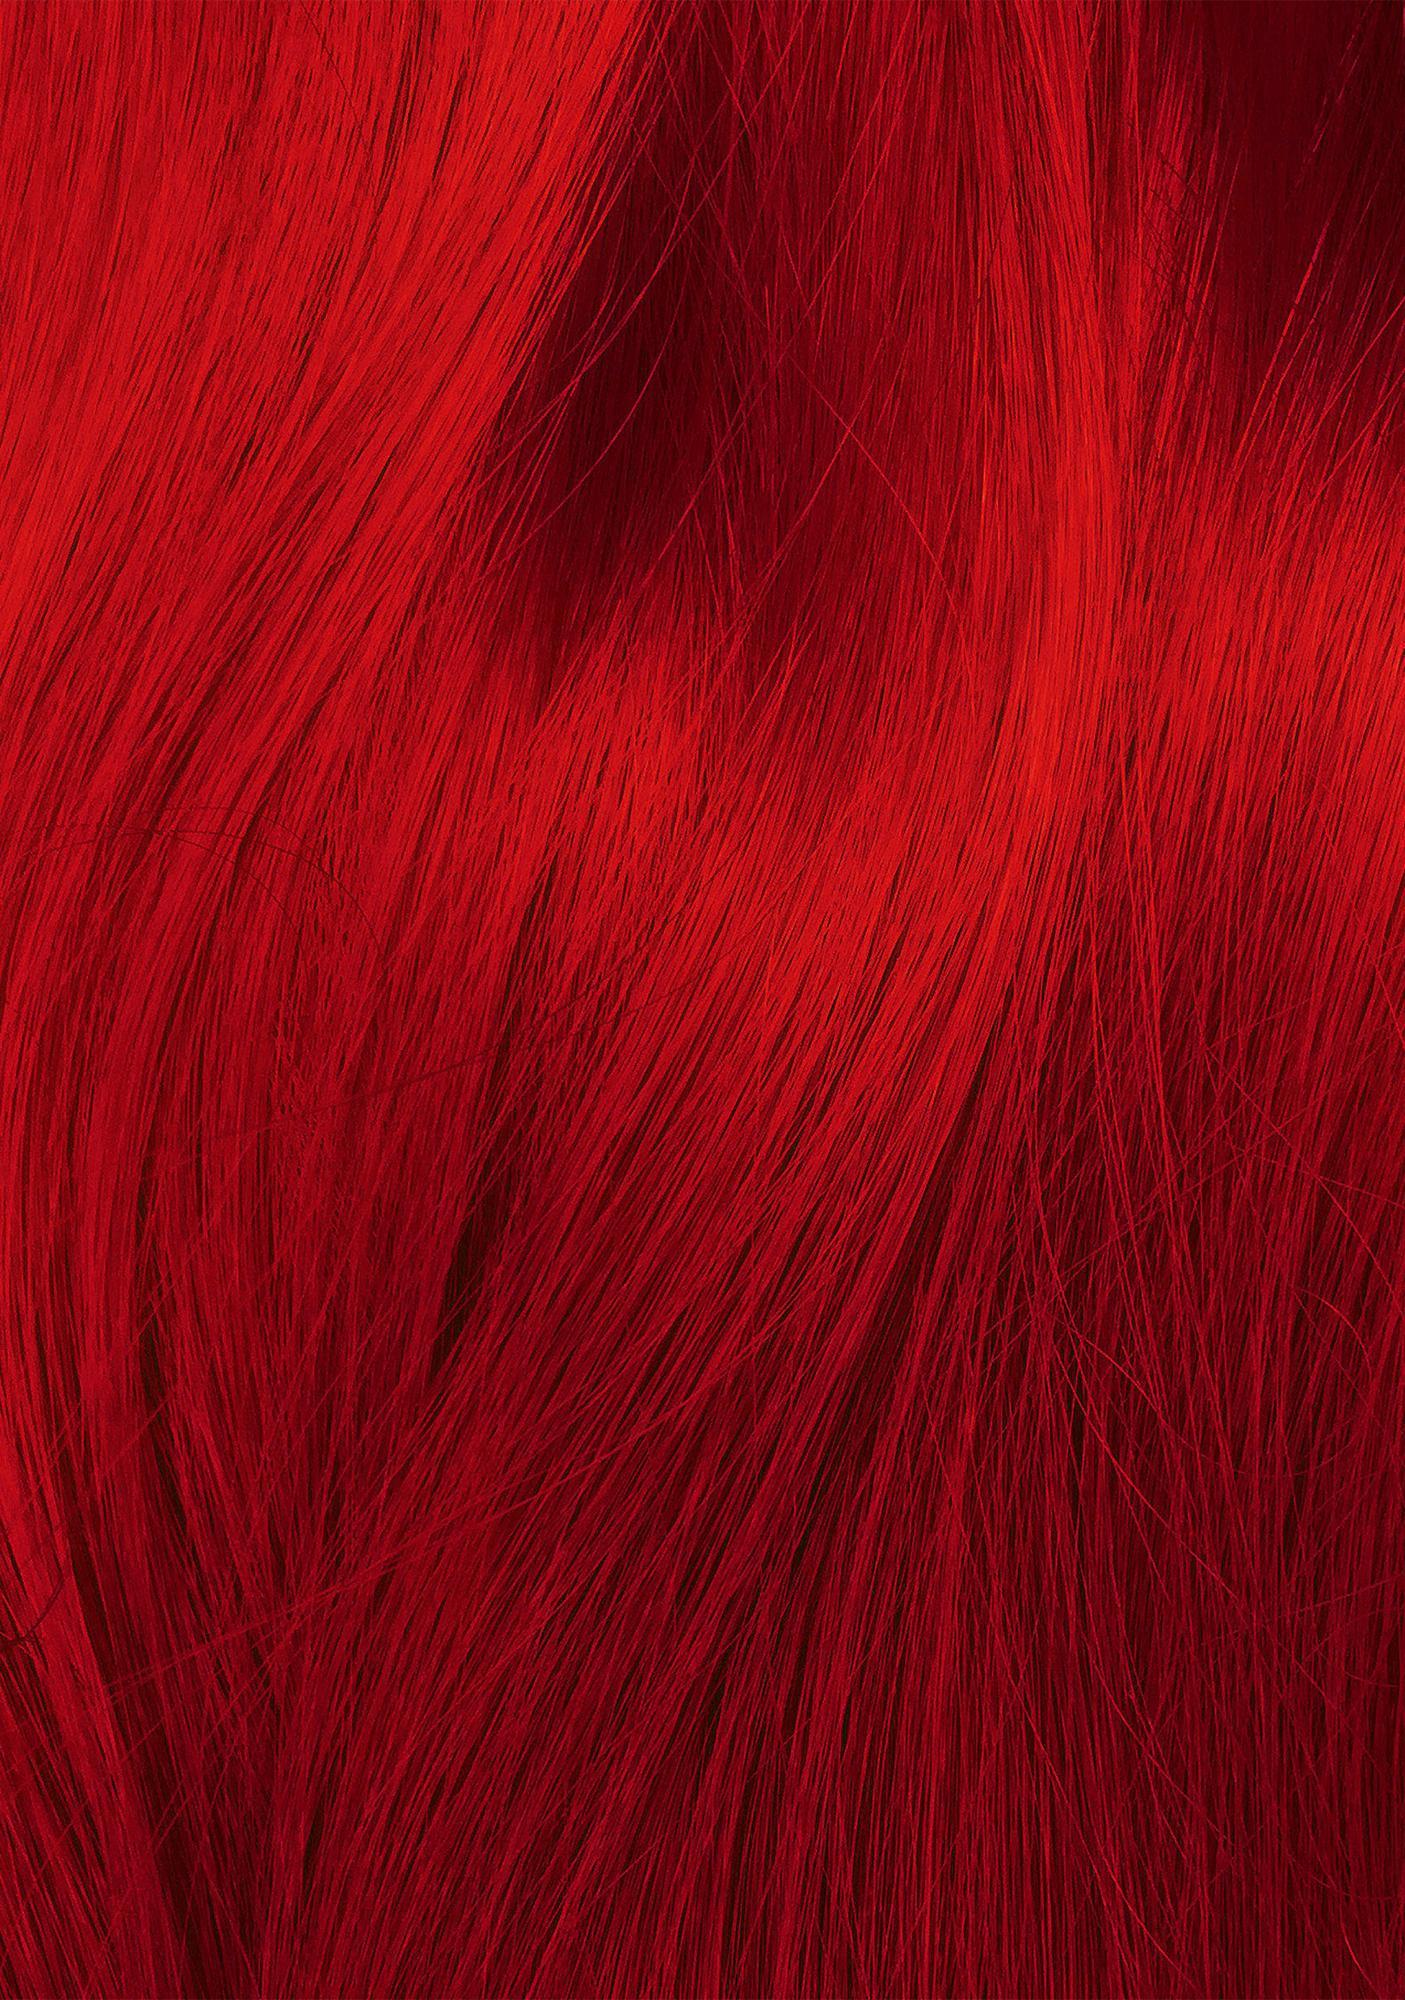 Lime Crime Valentine Unicorn Hair Dye